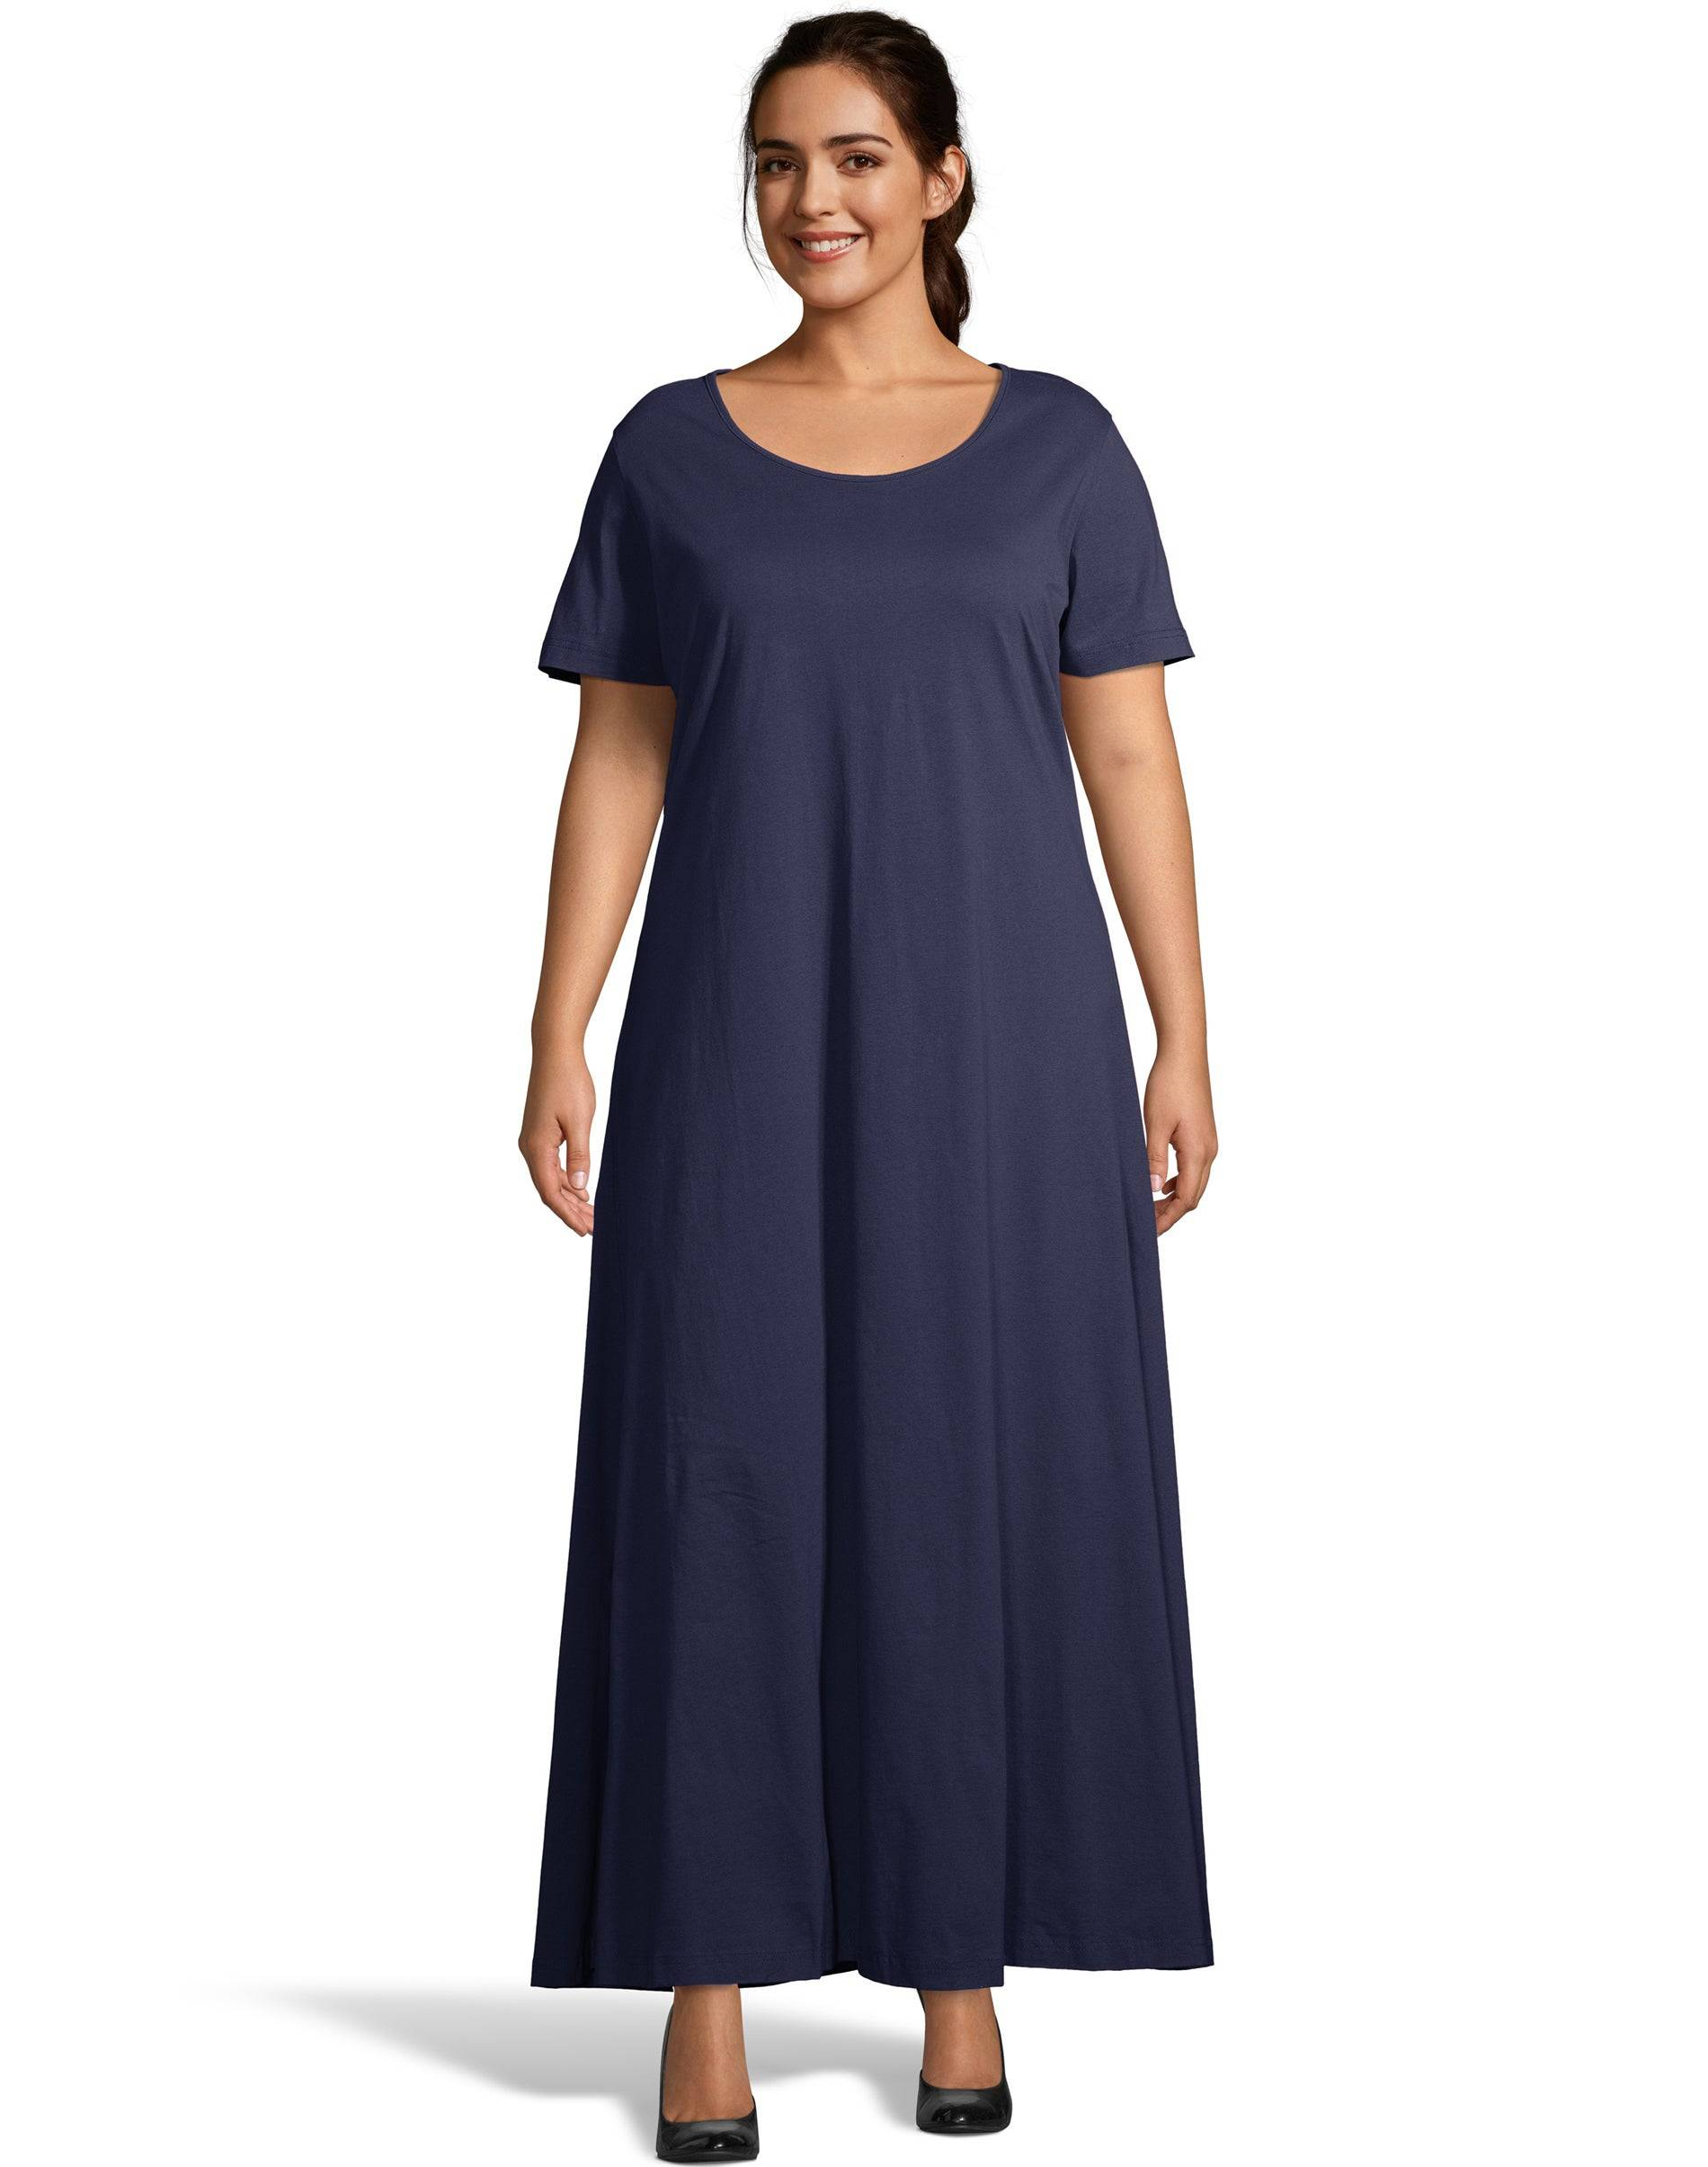 Just My Size Jersey Matchables Maxi Dress Navy 3X Women's